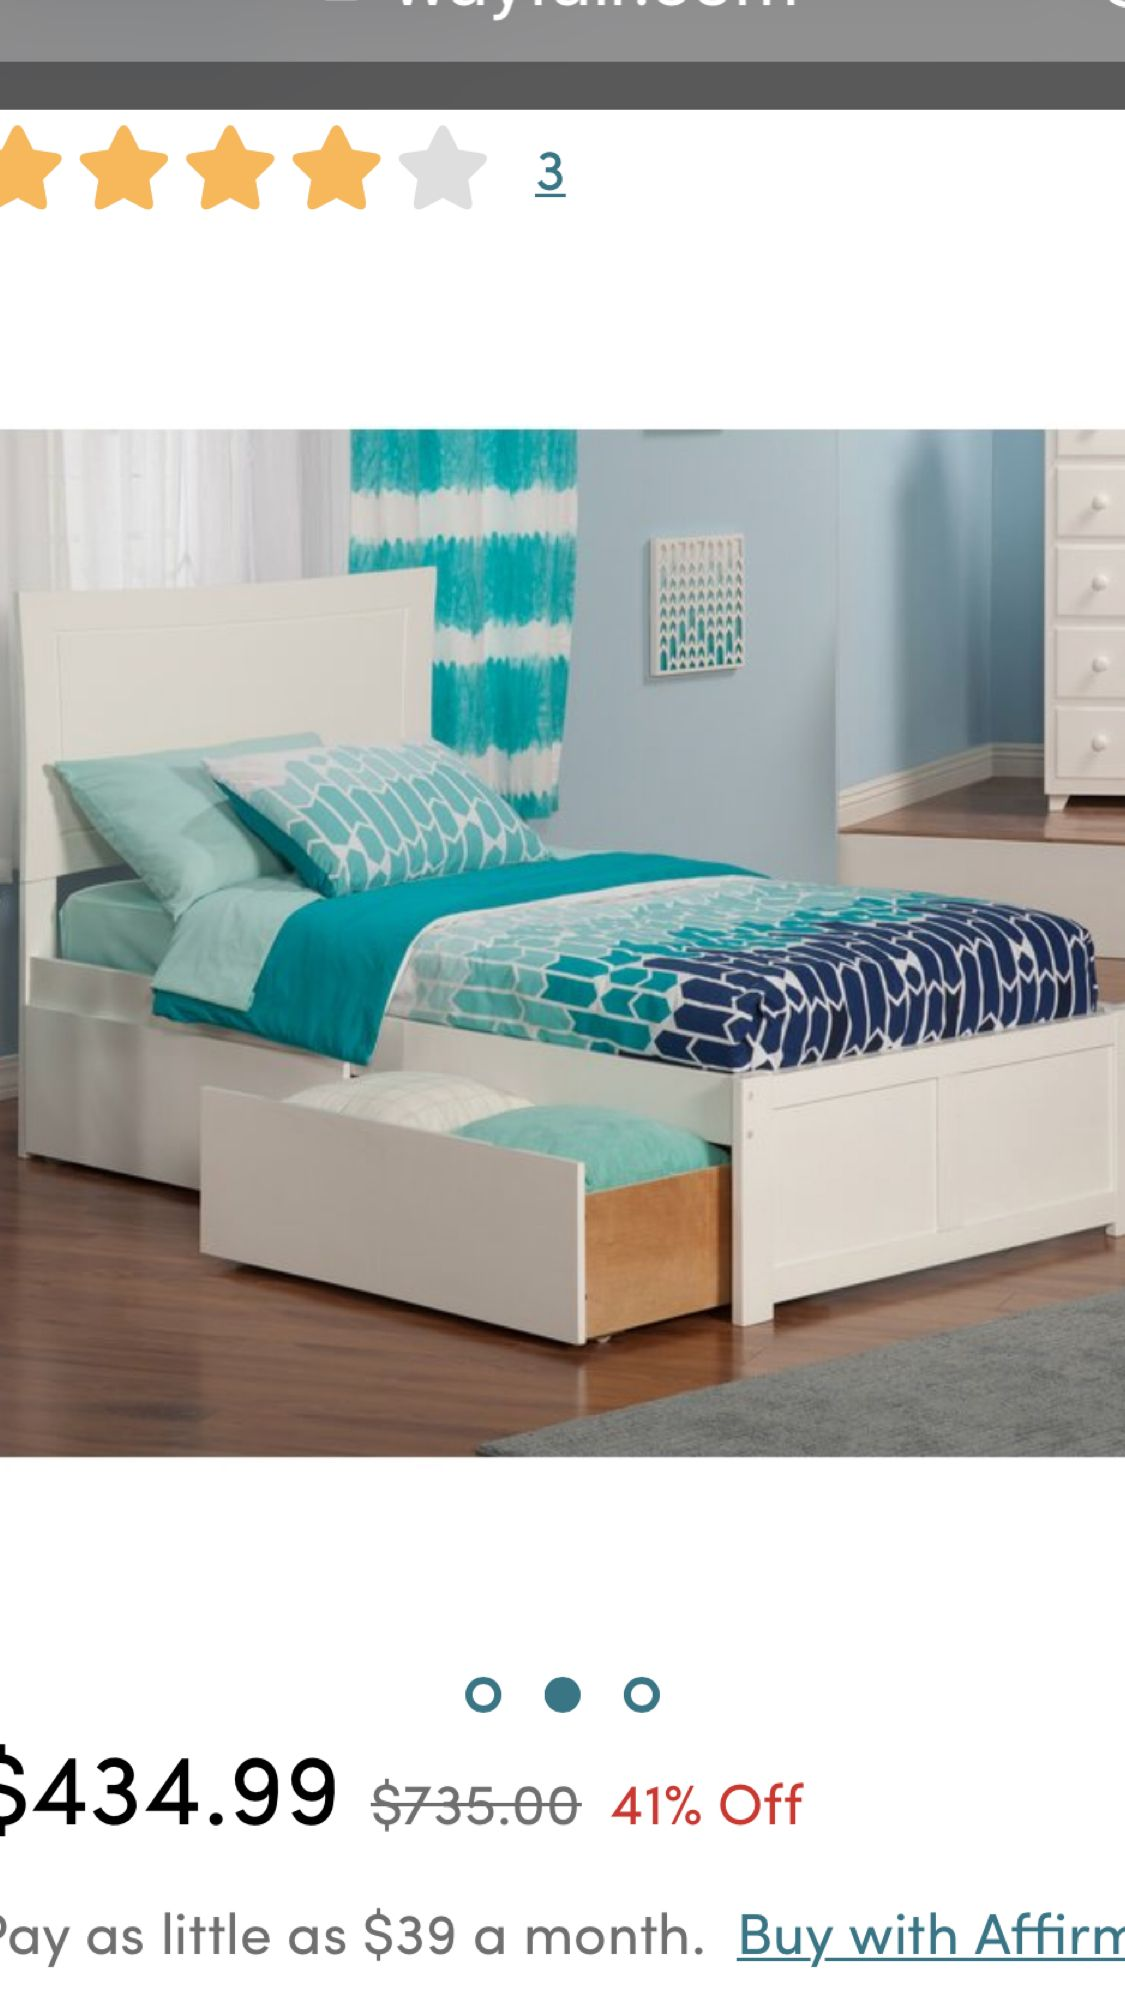 Wayfair twin xl bed with storage  Mattress bedroom, Twin xl